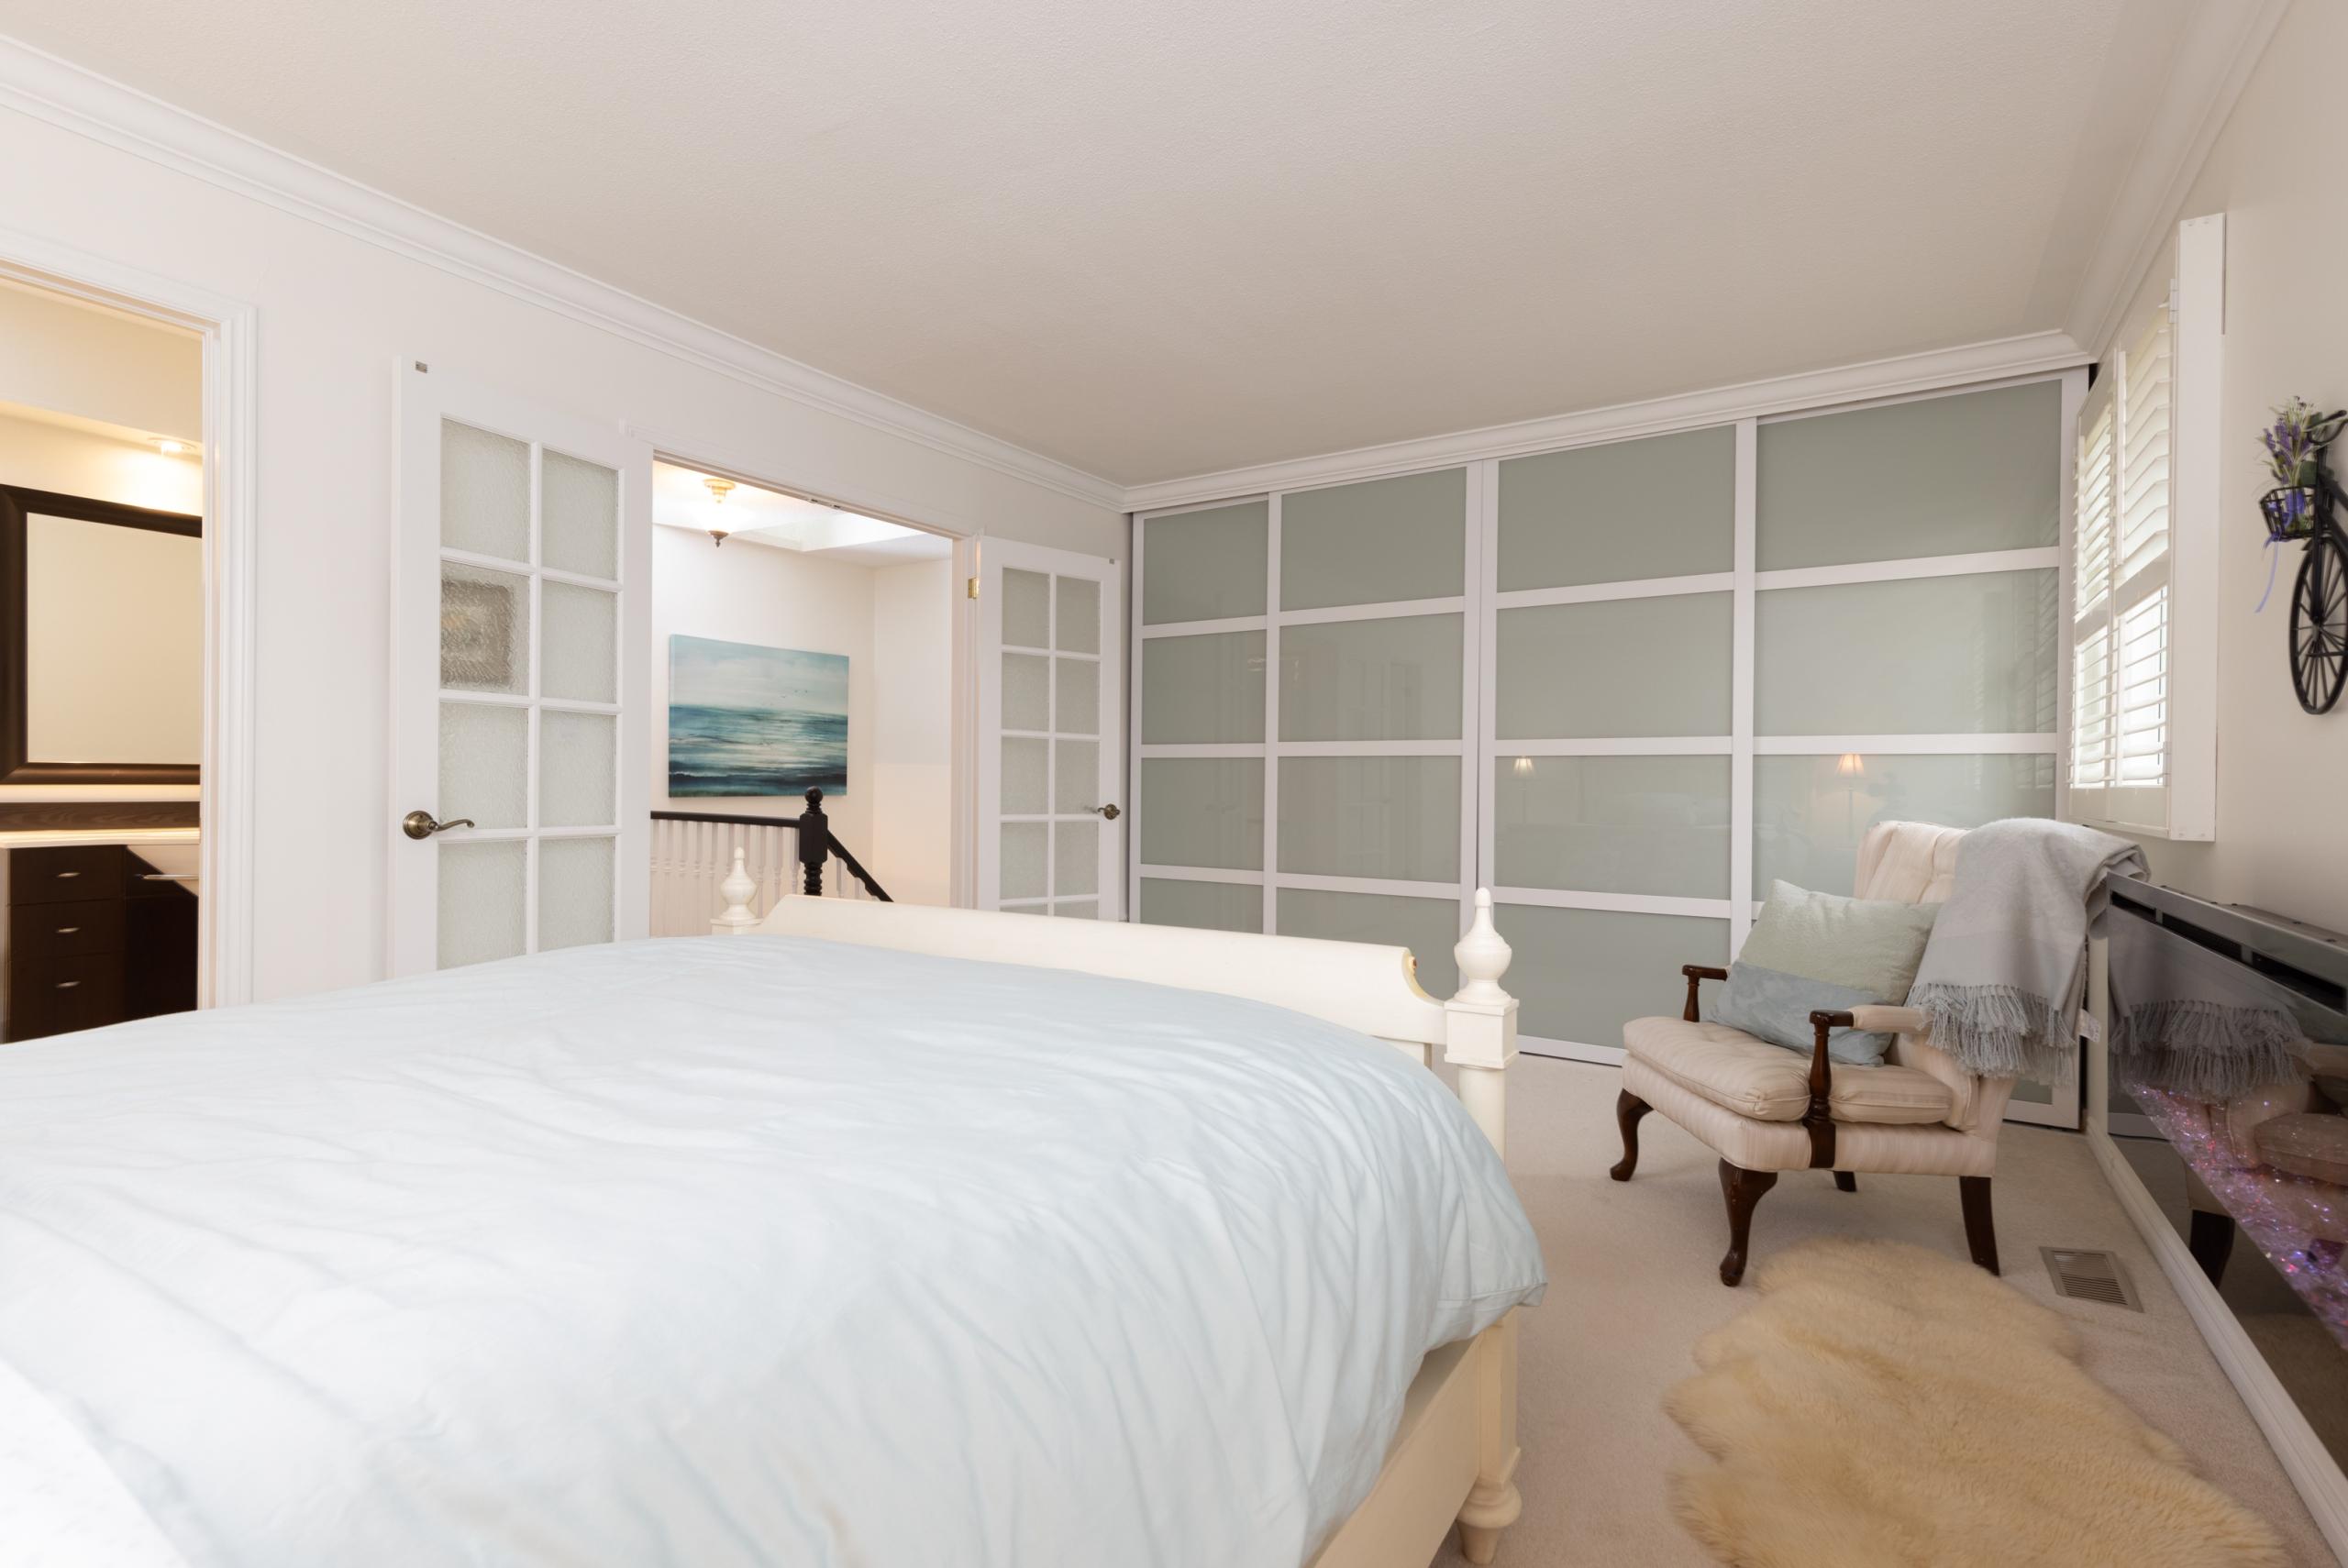 Bedroom featured at 16-2299 Marine Drive, Oakville, ON at Alex Irish & Associates